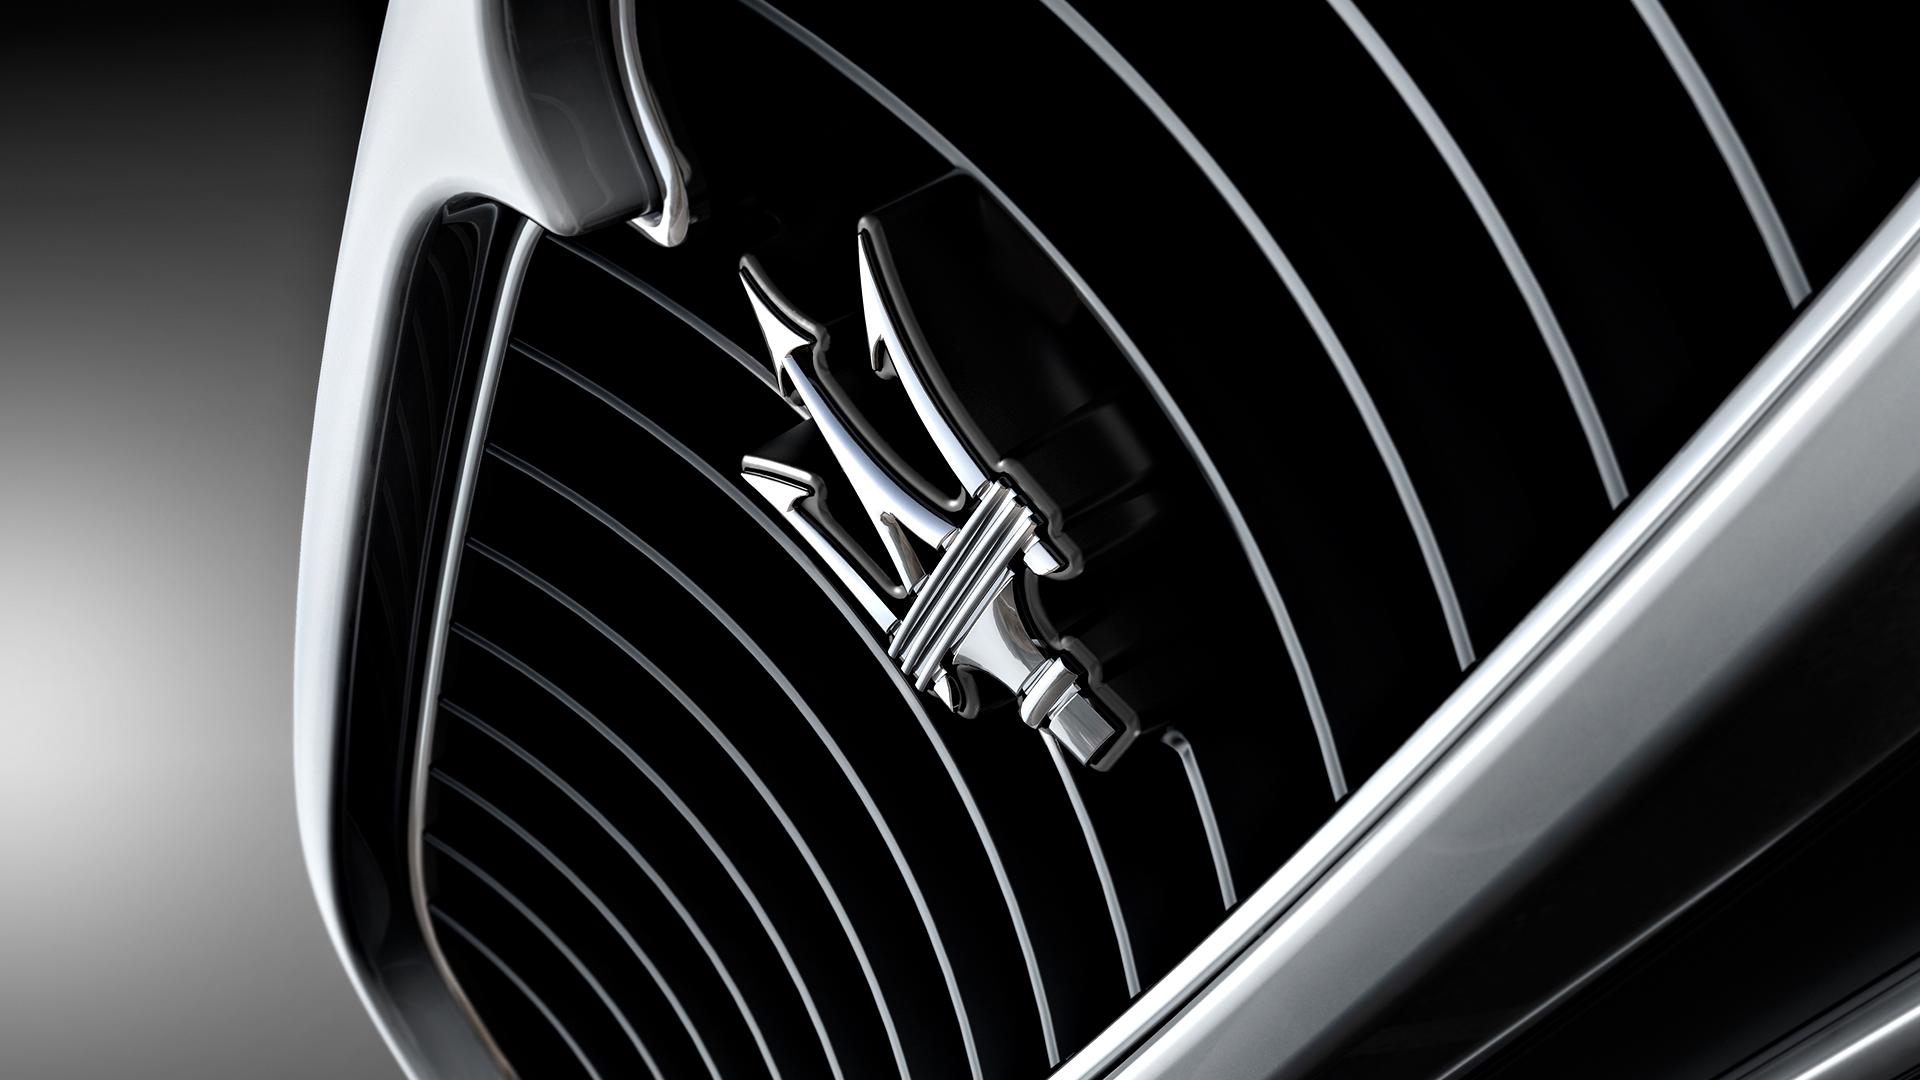 Maserati Logo Wallpaper 35383 1920x1080px 1920x1080